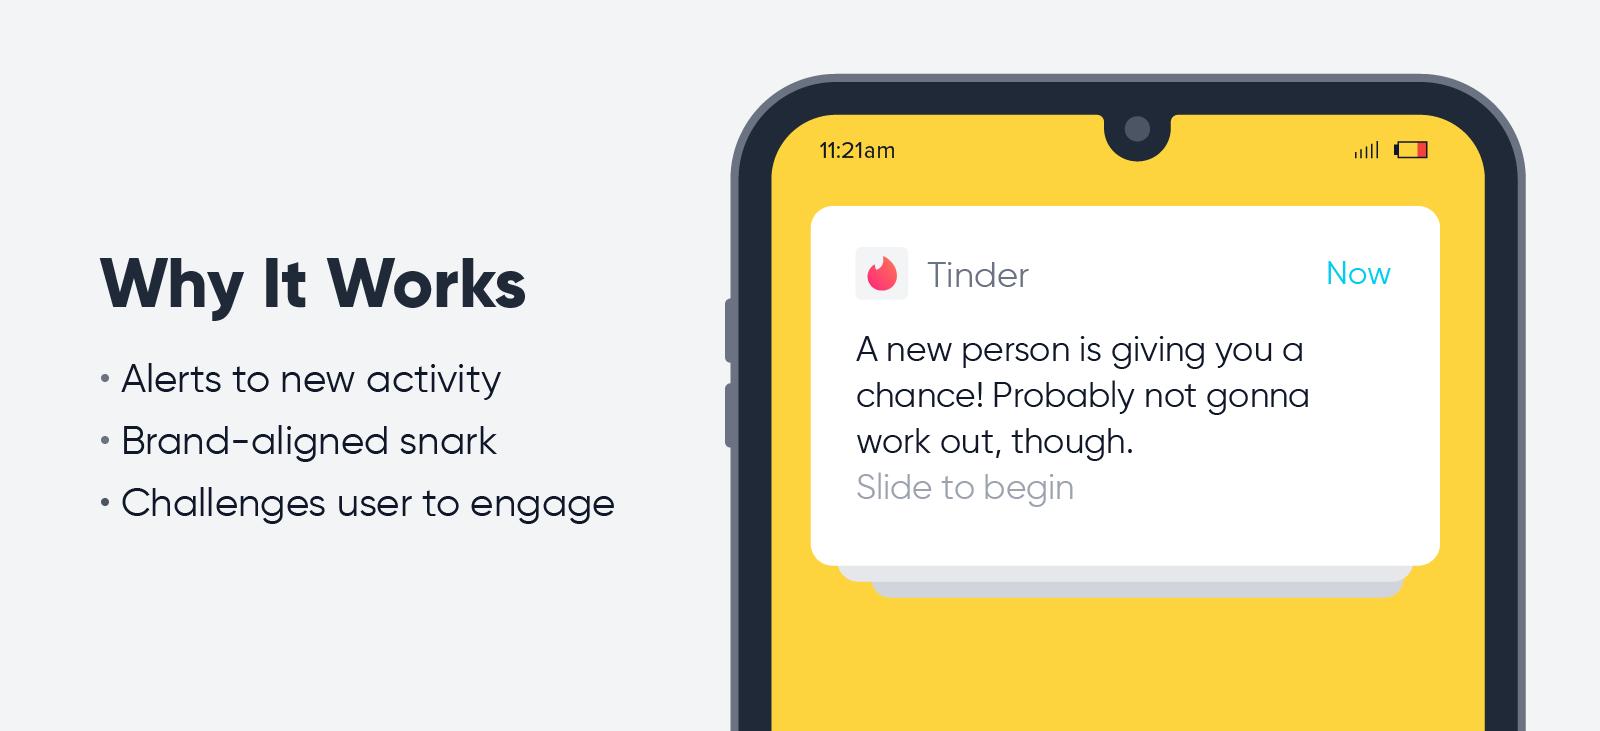 Tinder - push notification best practices